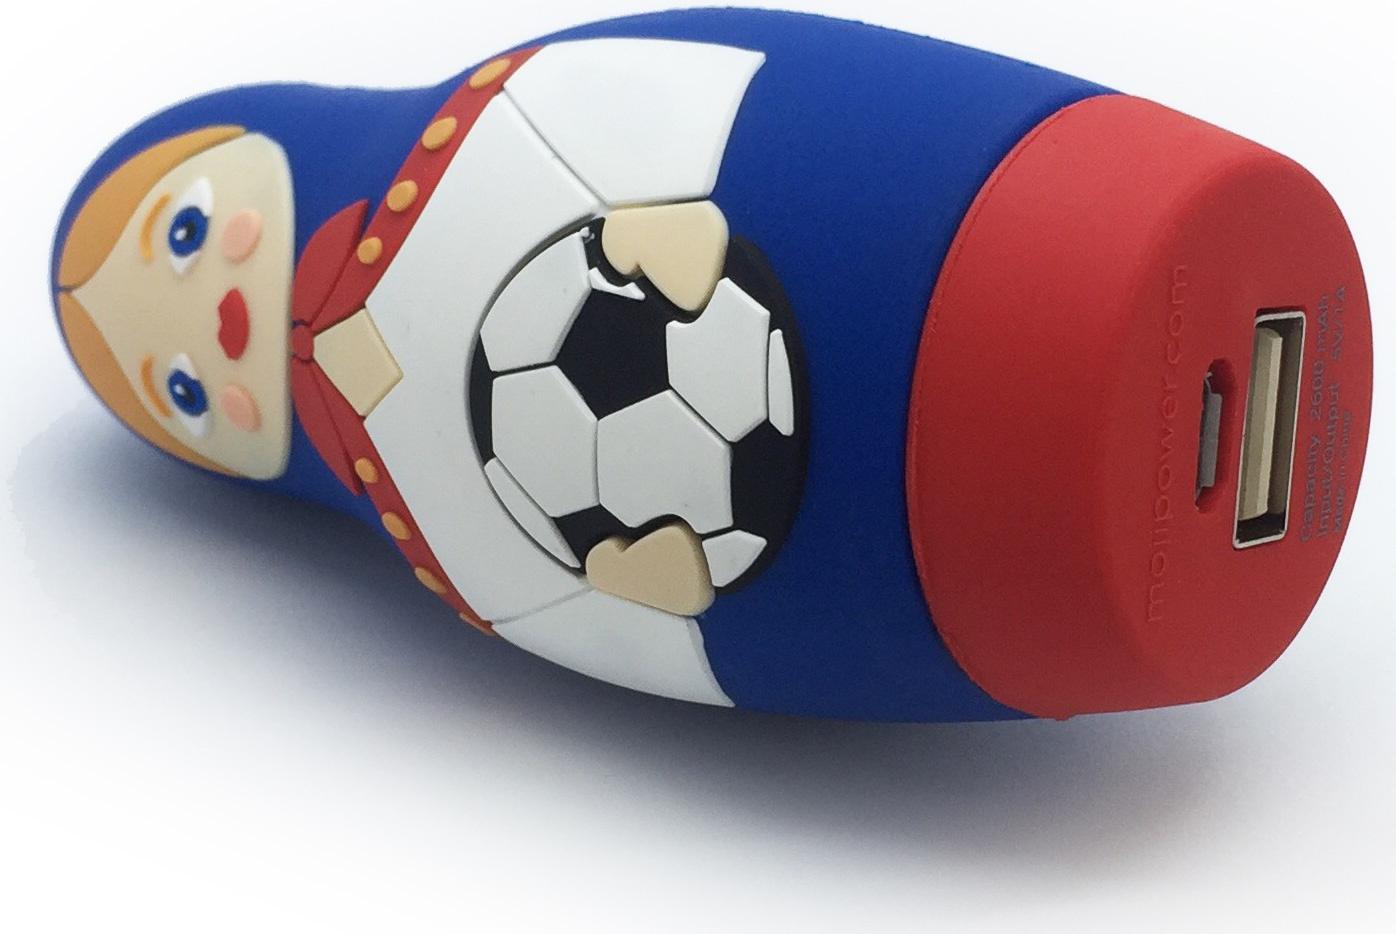 Фото - Внешний аккумулятор Mojipower Matreshka, MP-001-MA, синий, красный, белый mojipower аккумулятор mojipower heart